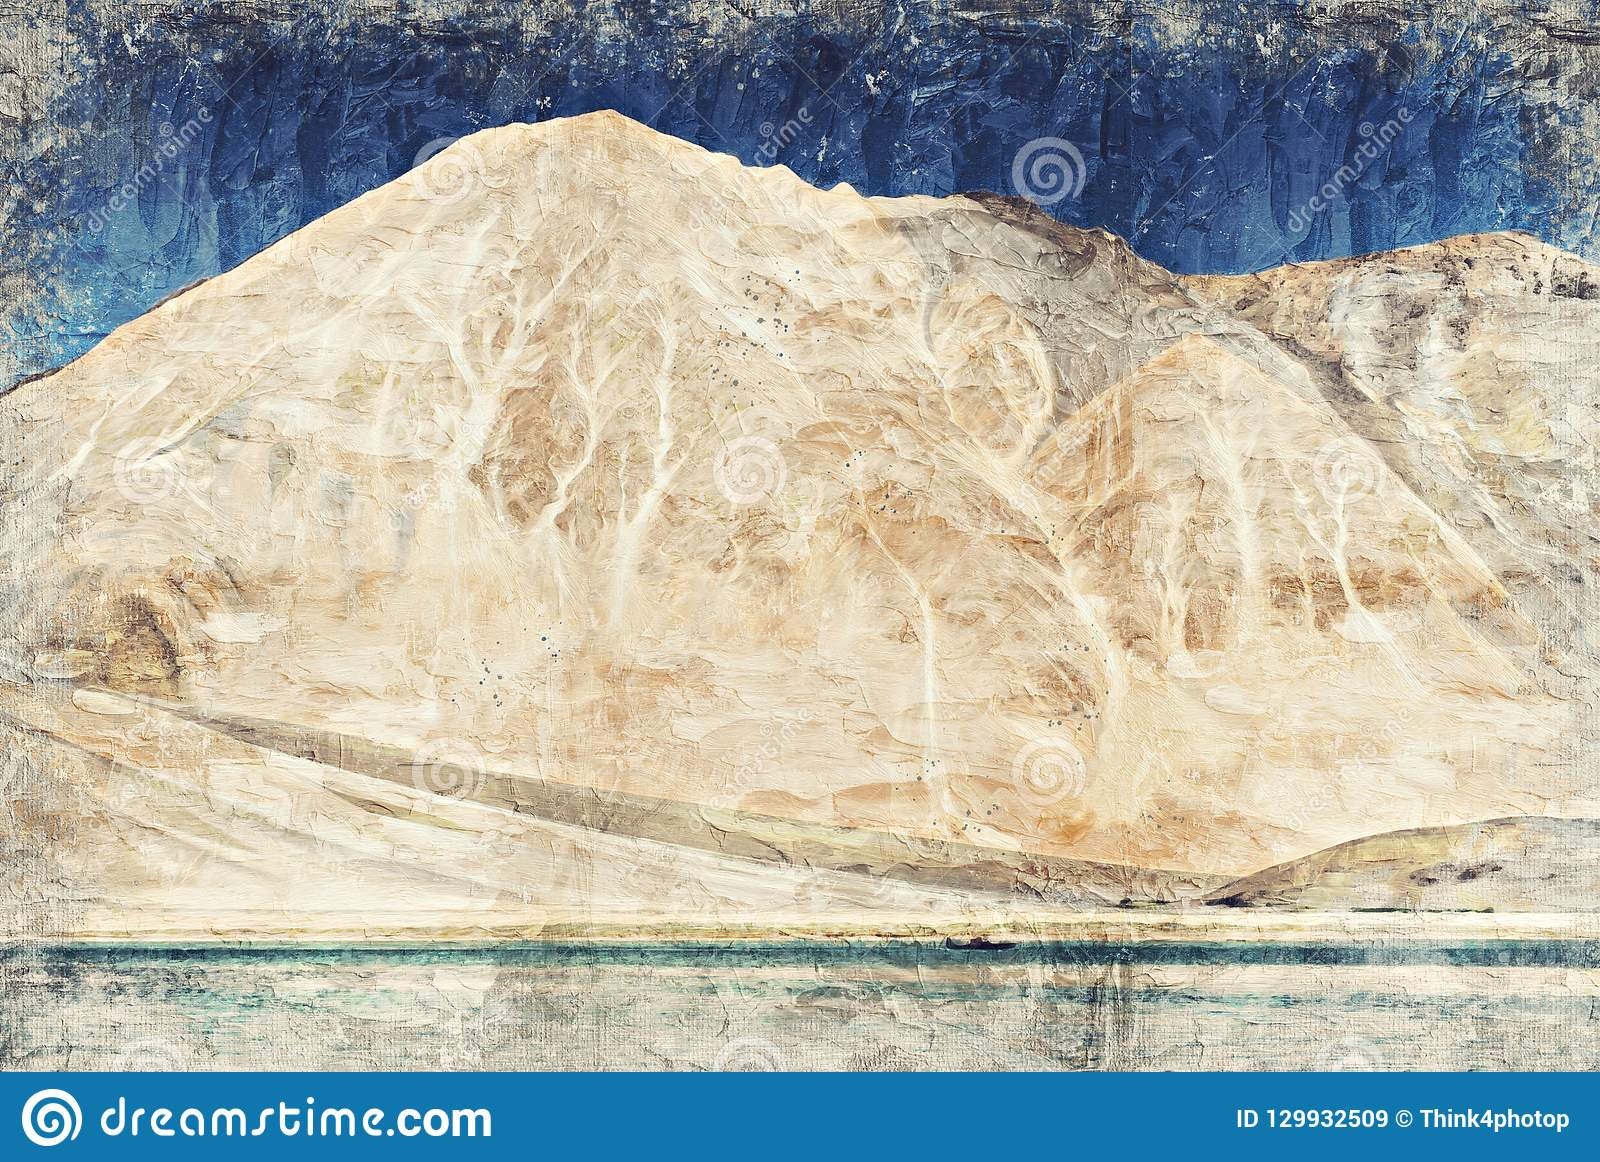 Pankongmeer Leh Ladakh India Digitaal Art Impasto Oil Painting